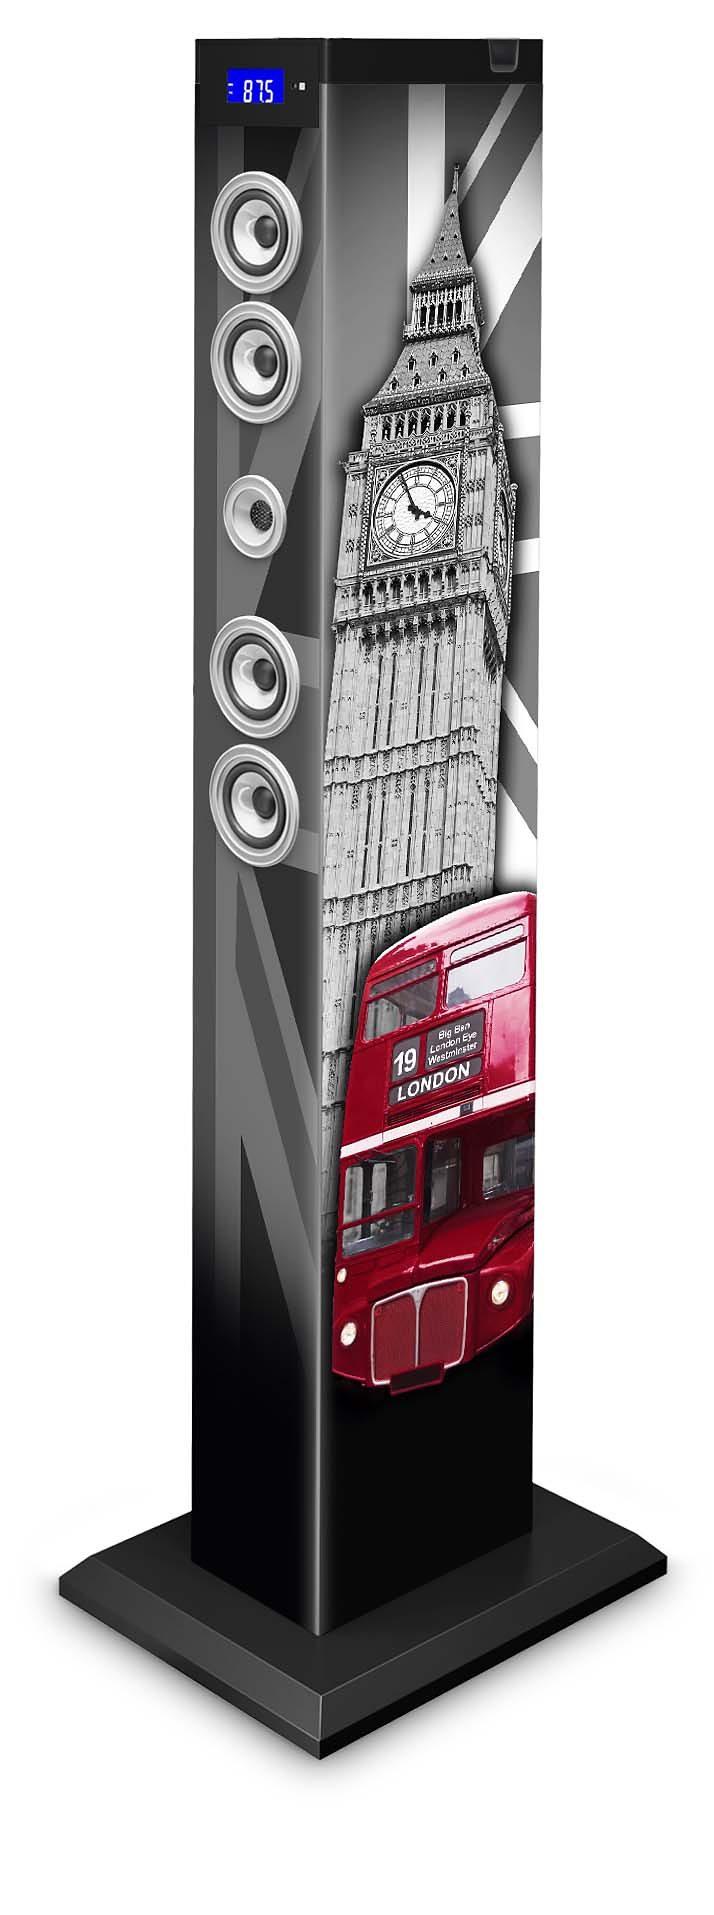 bigben 2.1 Multimedia Lautsprecher »Sound Tower TW9 - London«